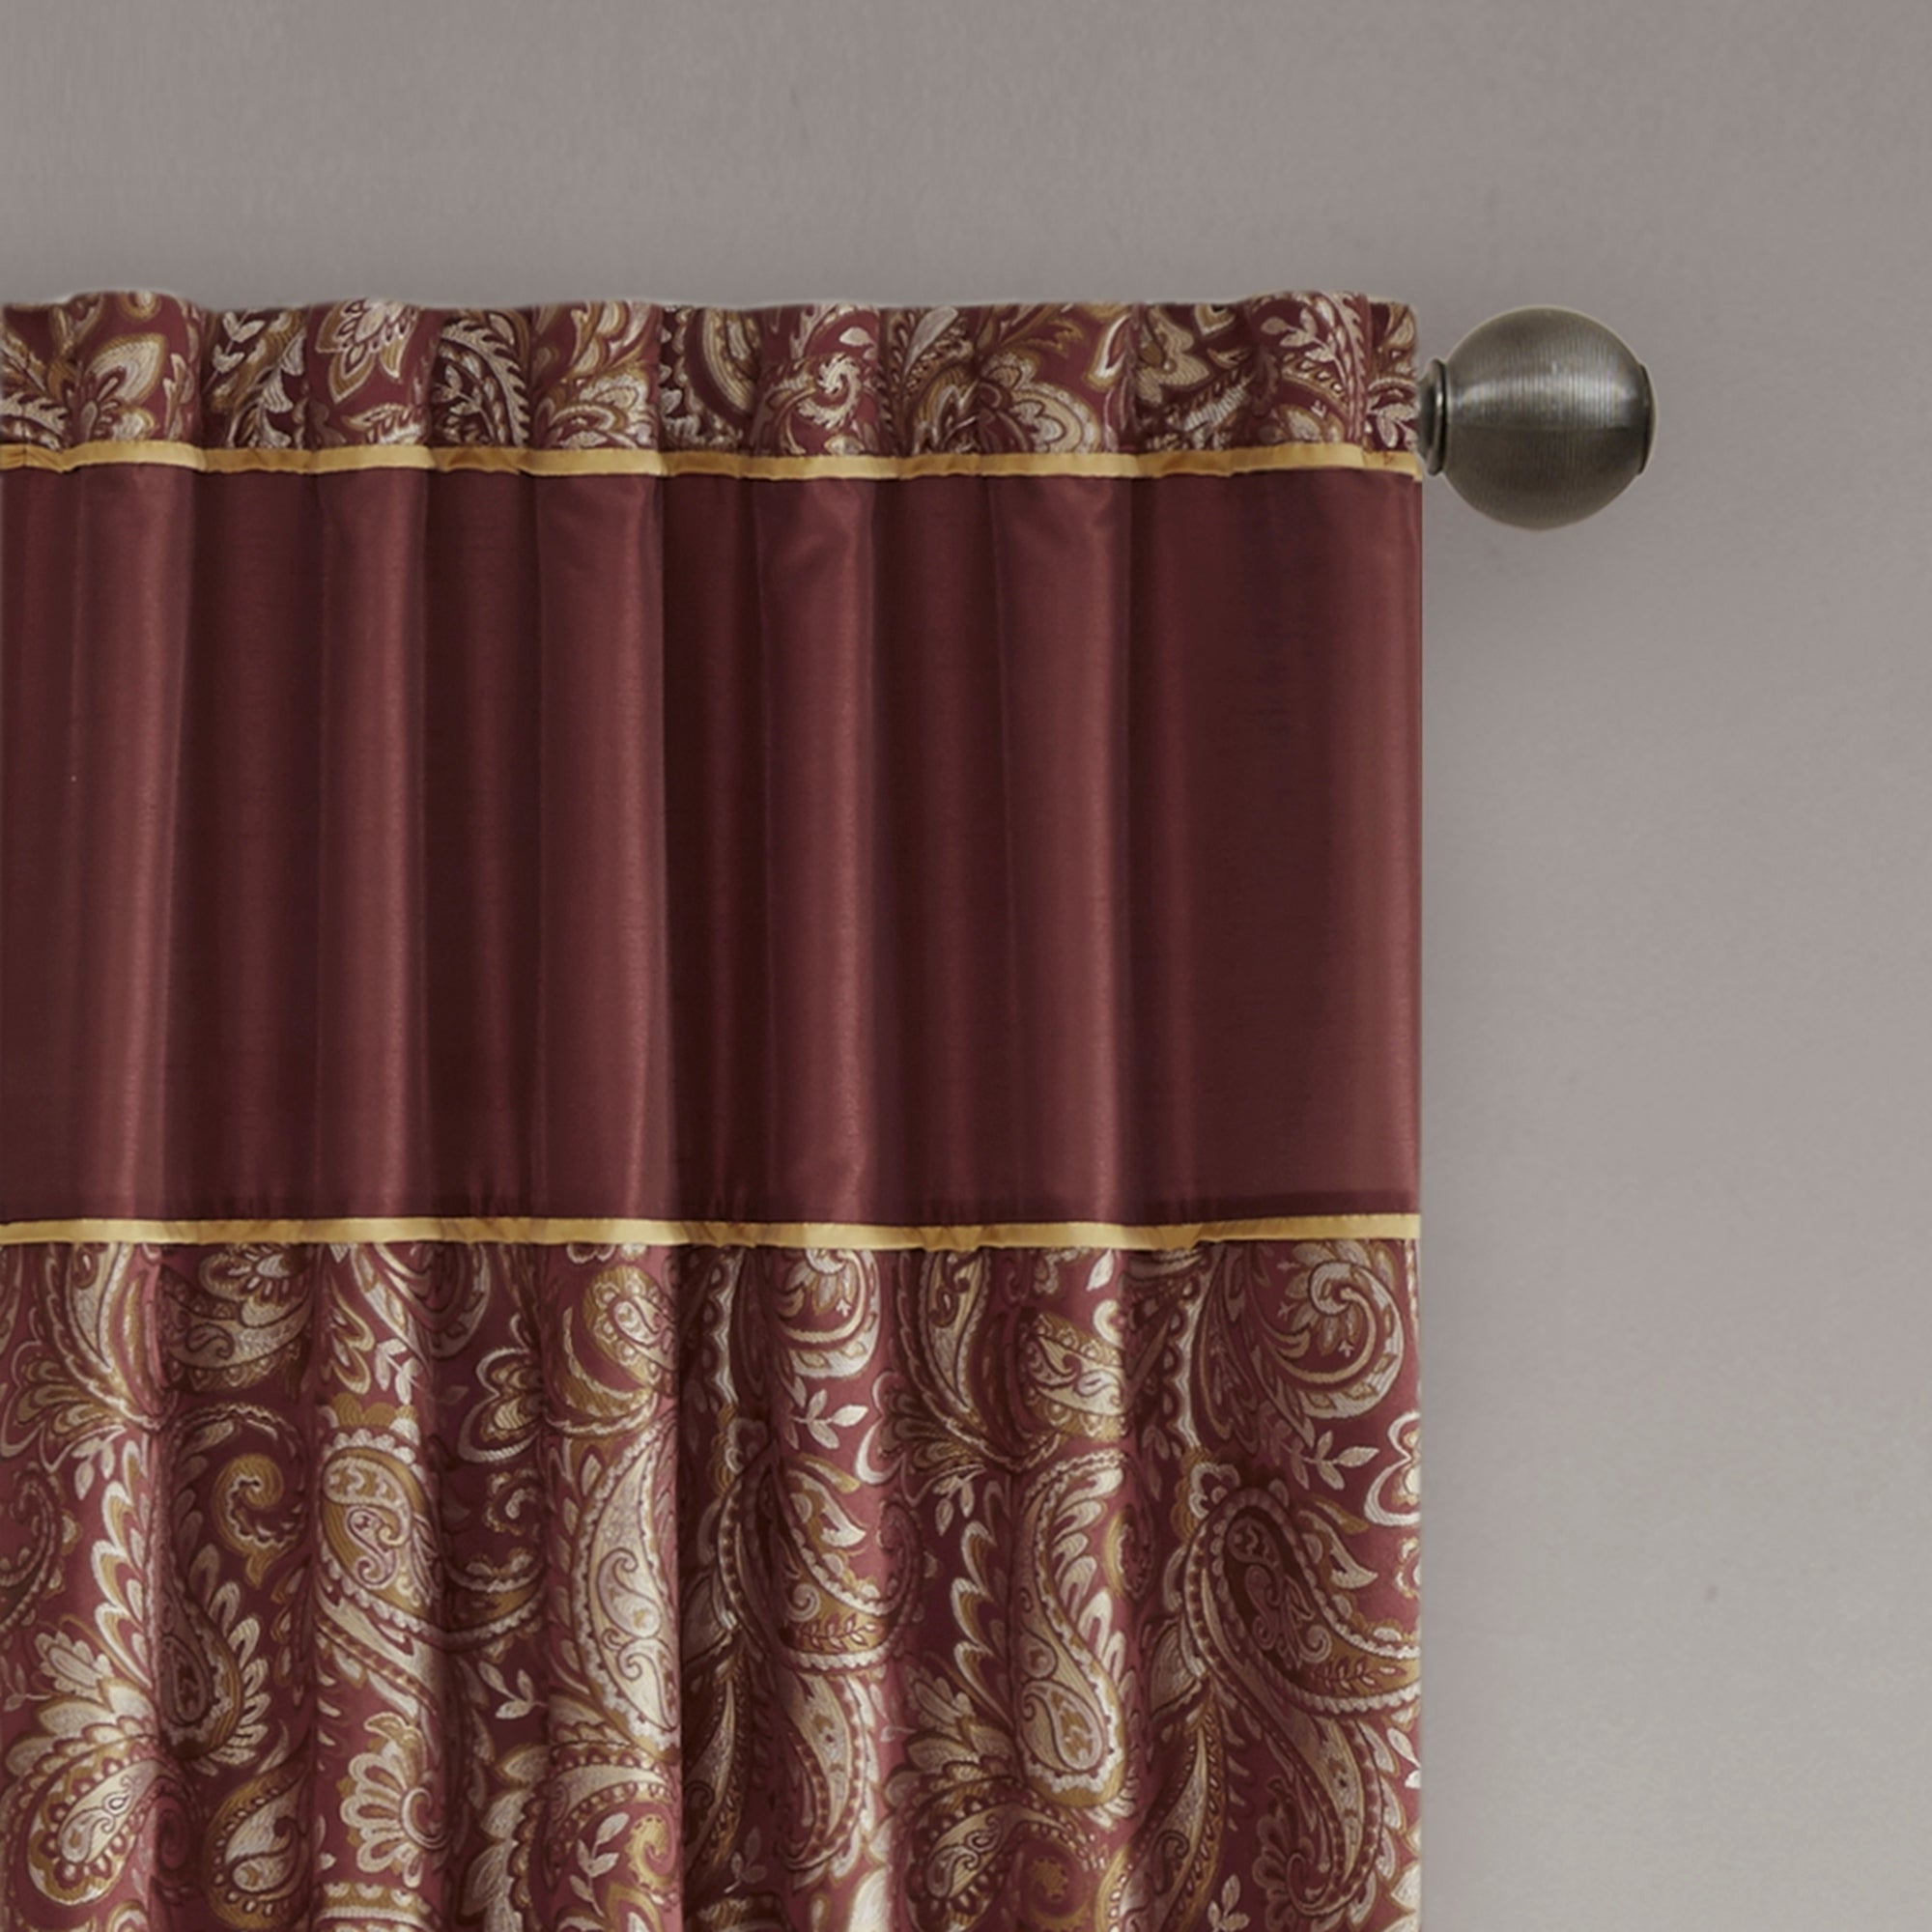 Madison Park Whitman Curtain Panel Pair Pertaining To 2020 Whitman Curtain Panel Pairs (View 13 of 20)